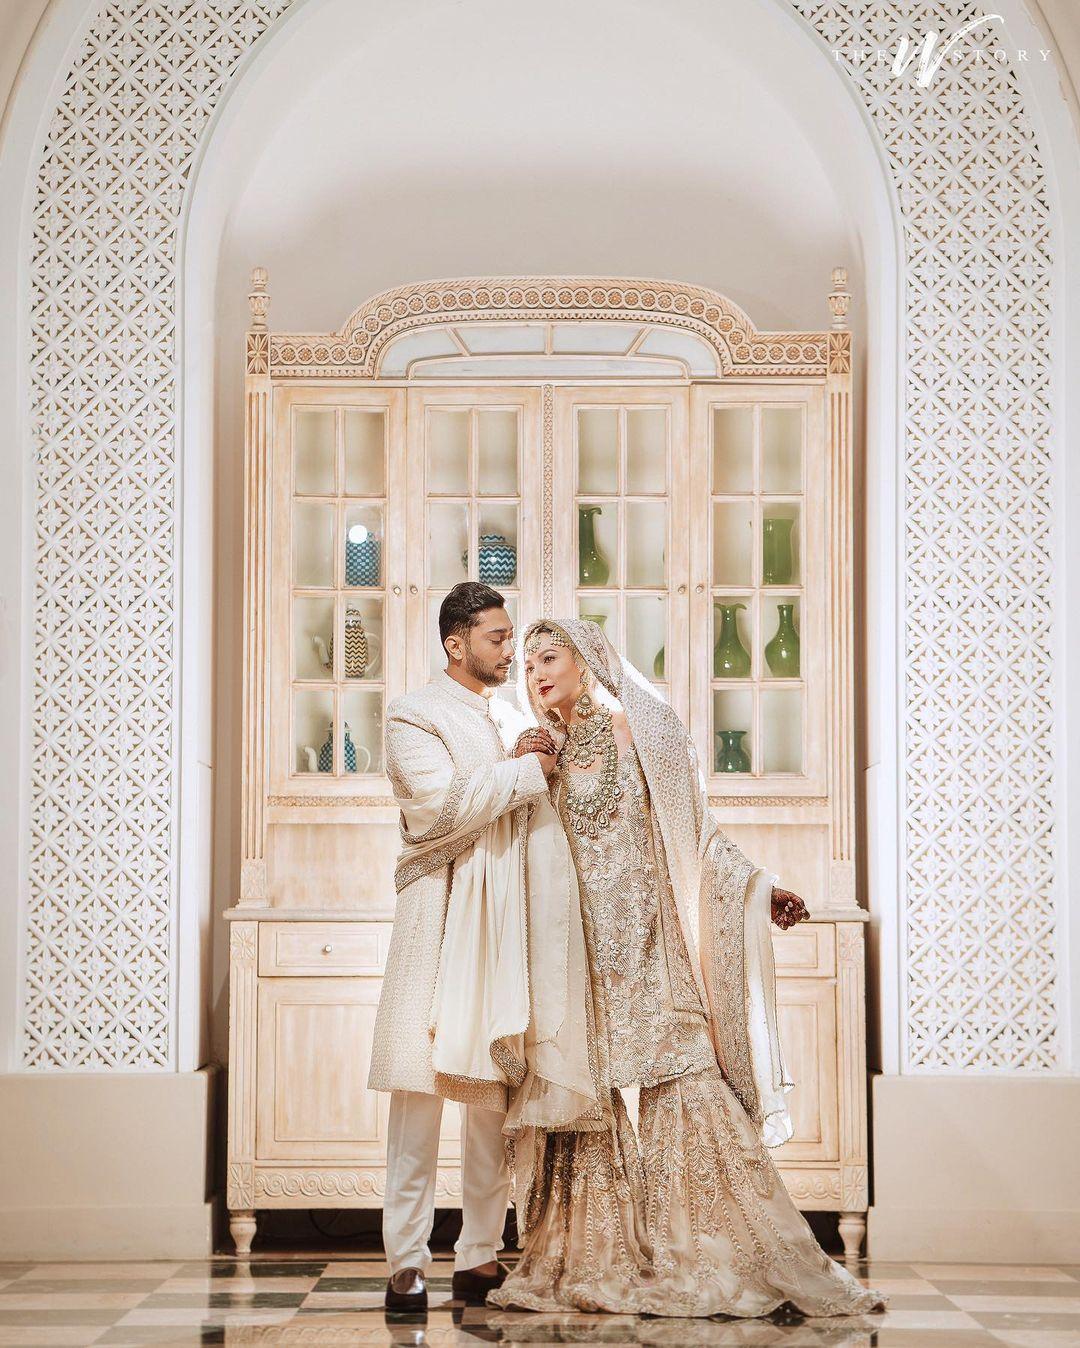 Gauahar and zaid wedding look